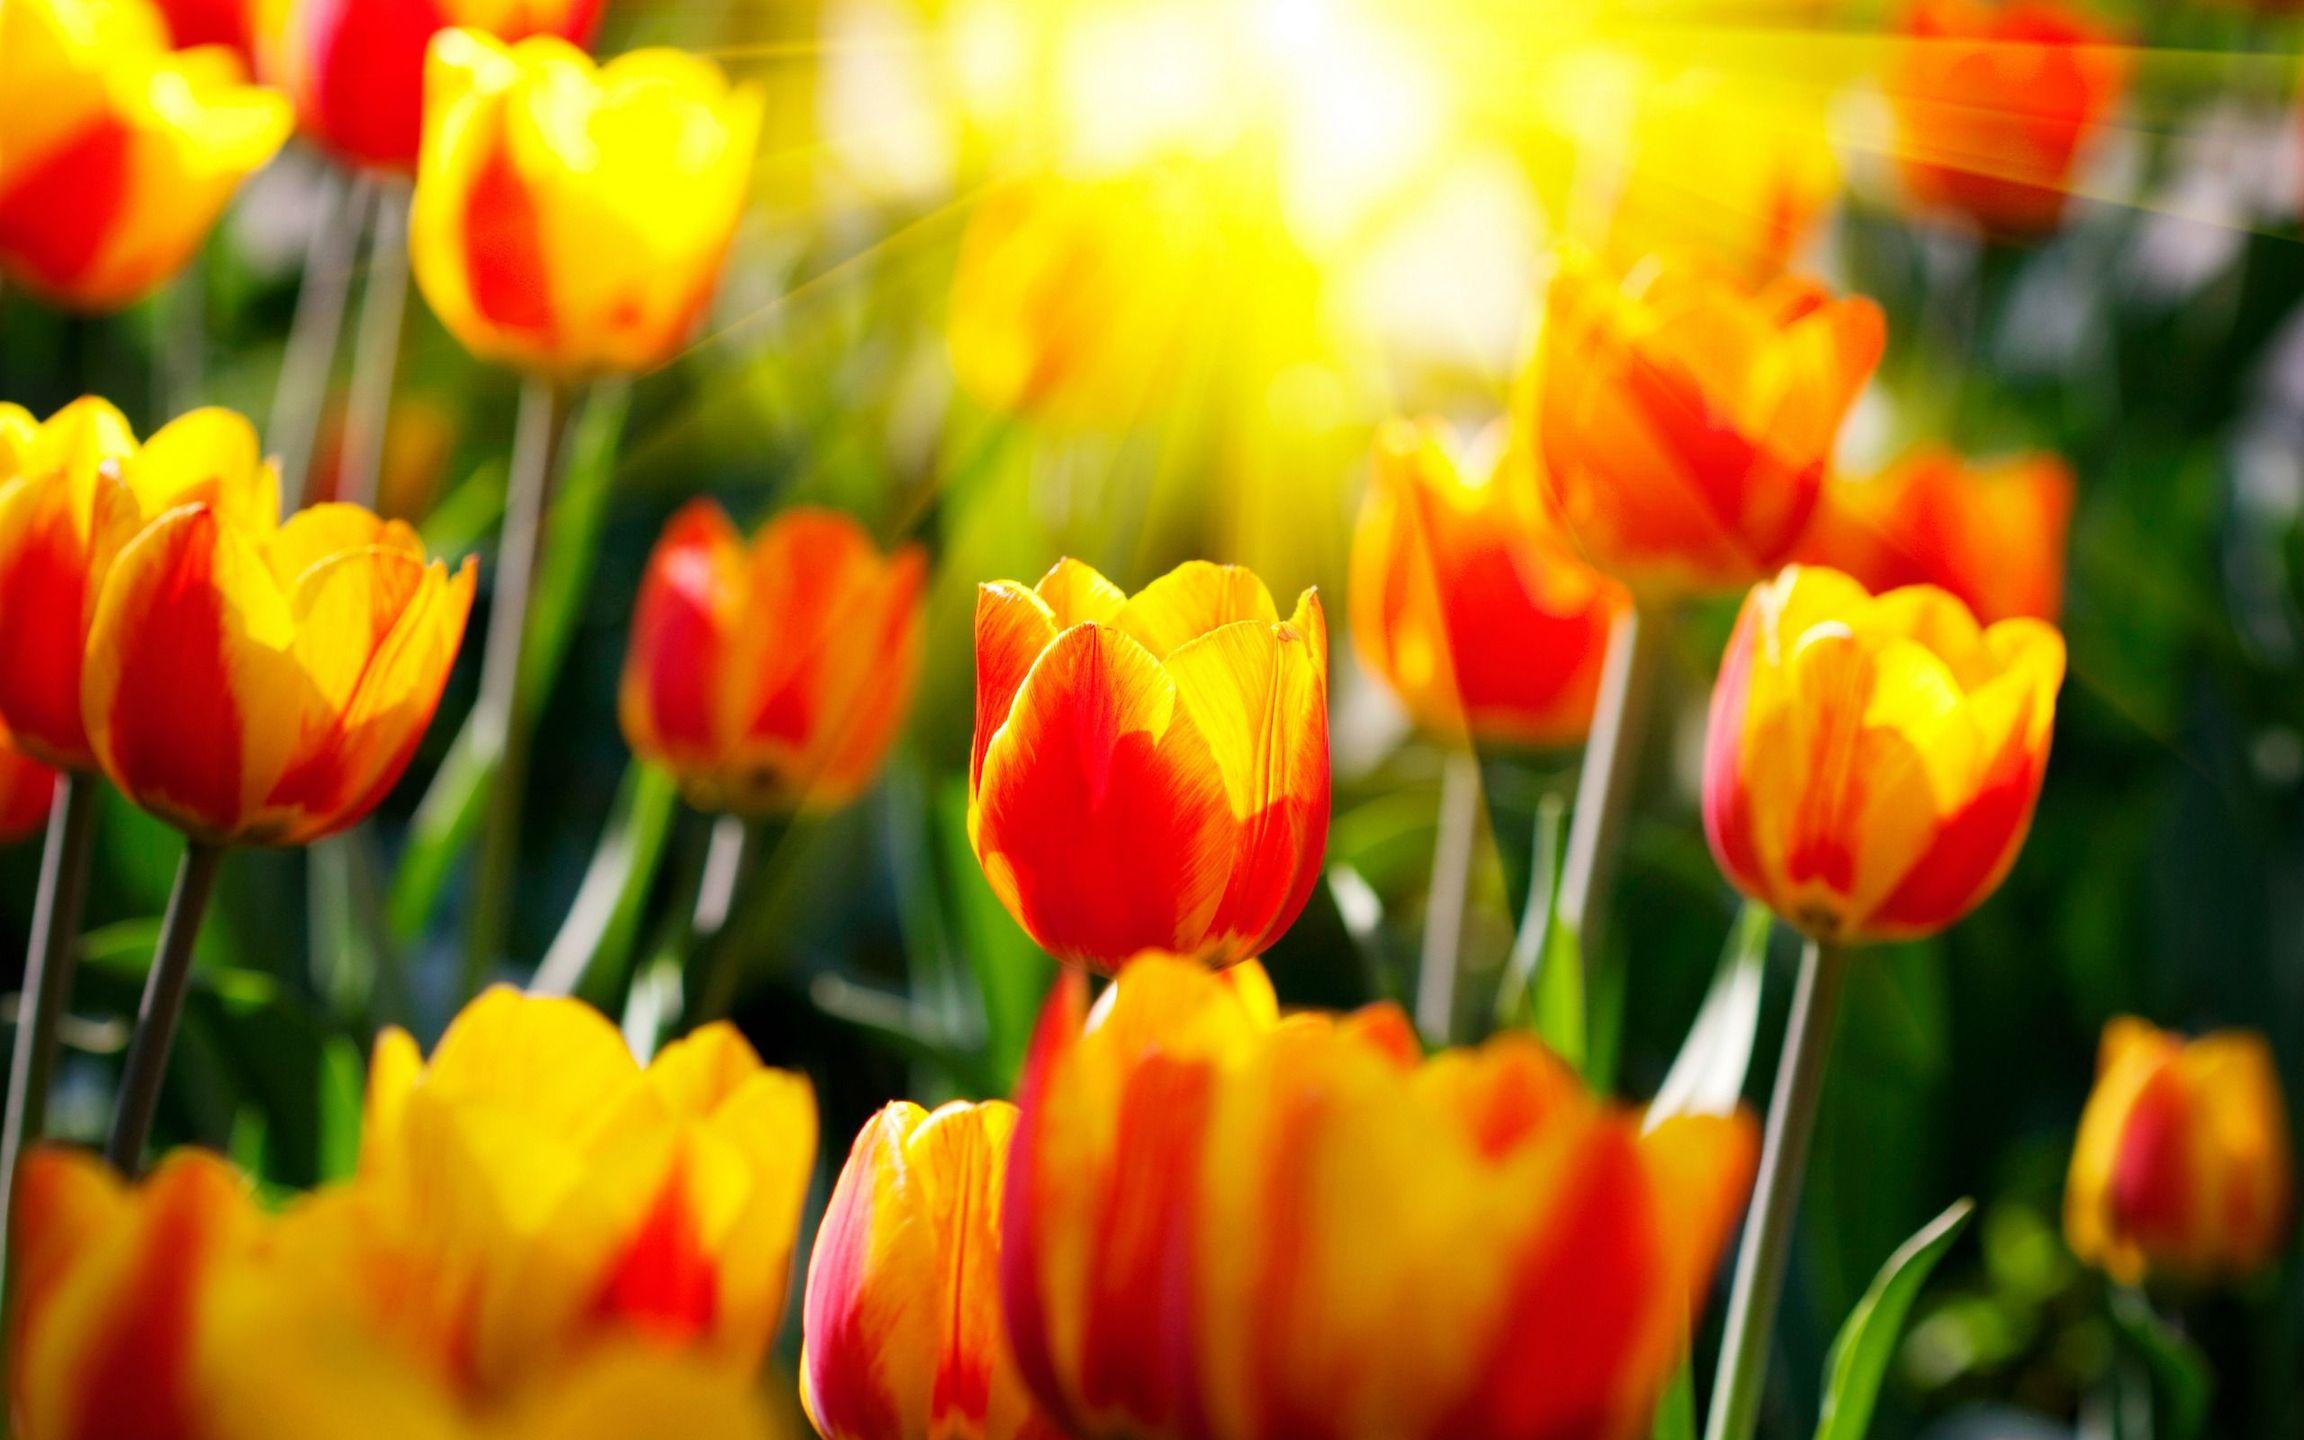 sunlight wallpaper flowers